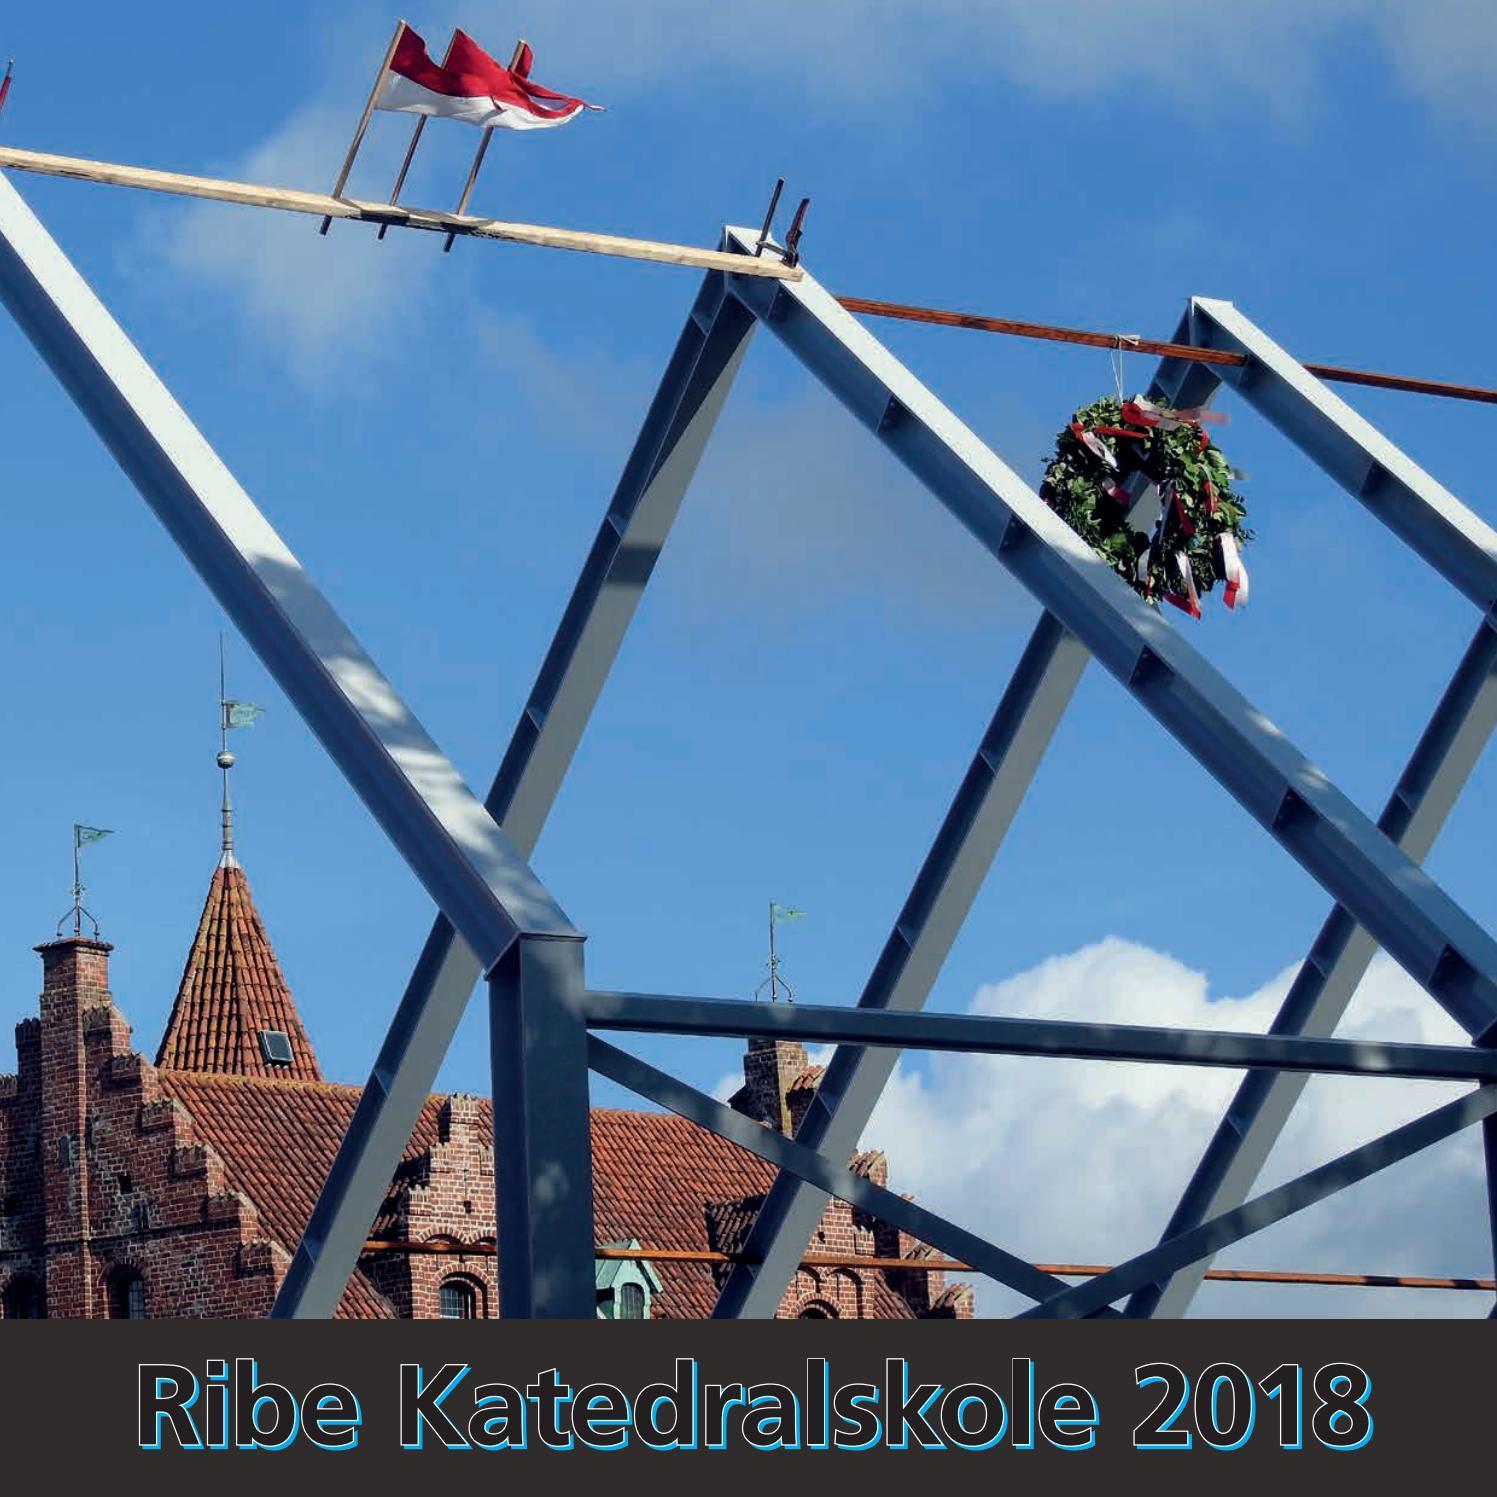 a2d5952630b0 Ribe Katedralskole Årsskrift 2018 by Grafisk Trykcenter - issuu